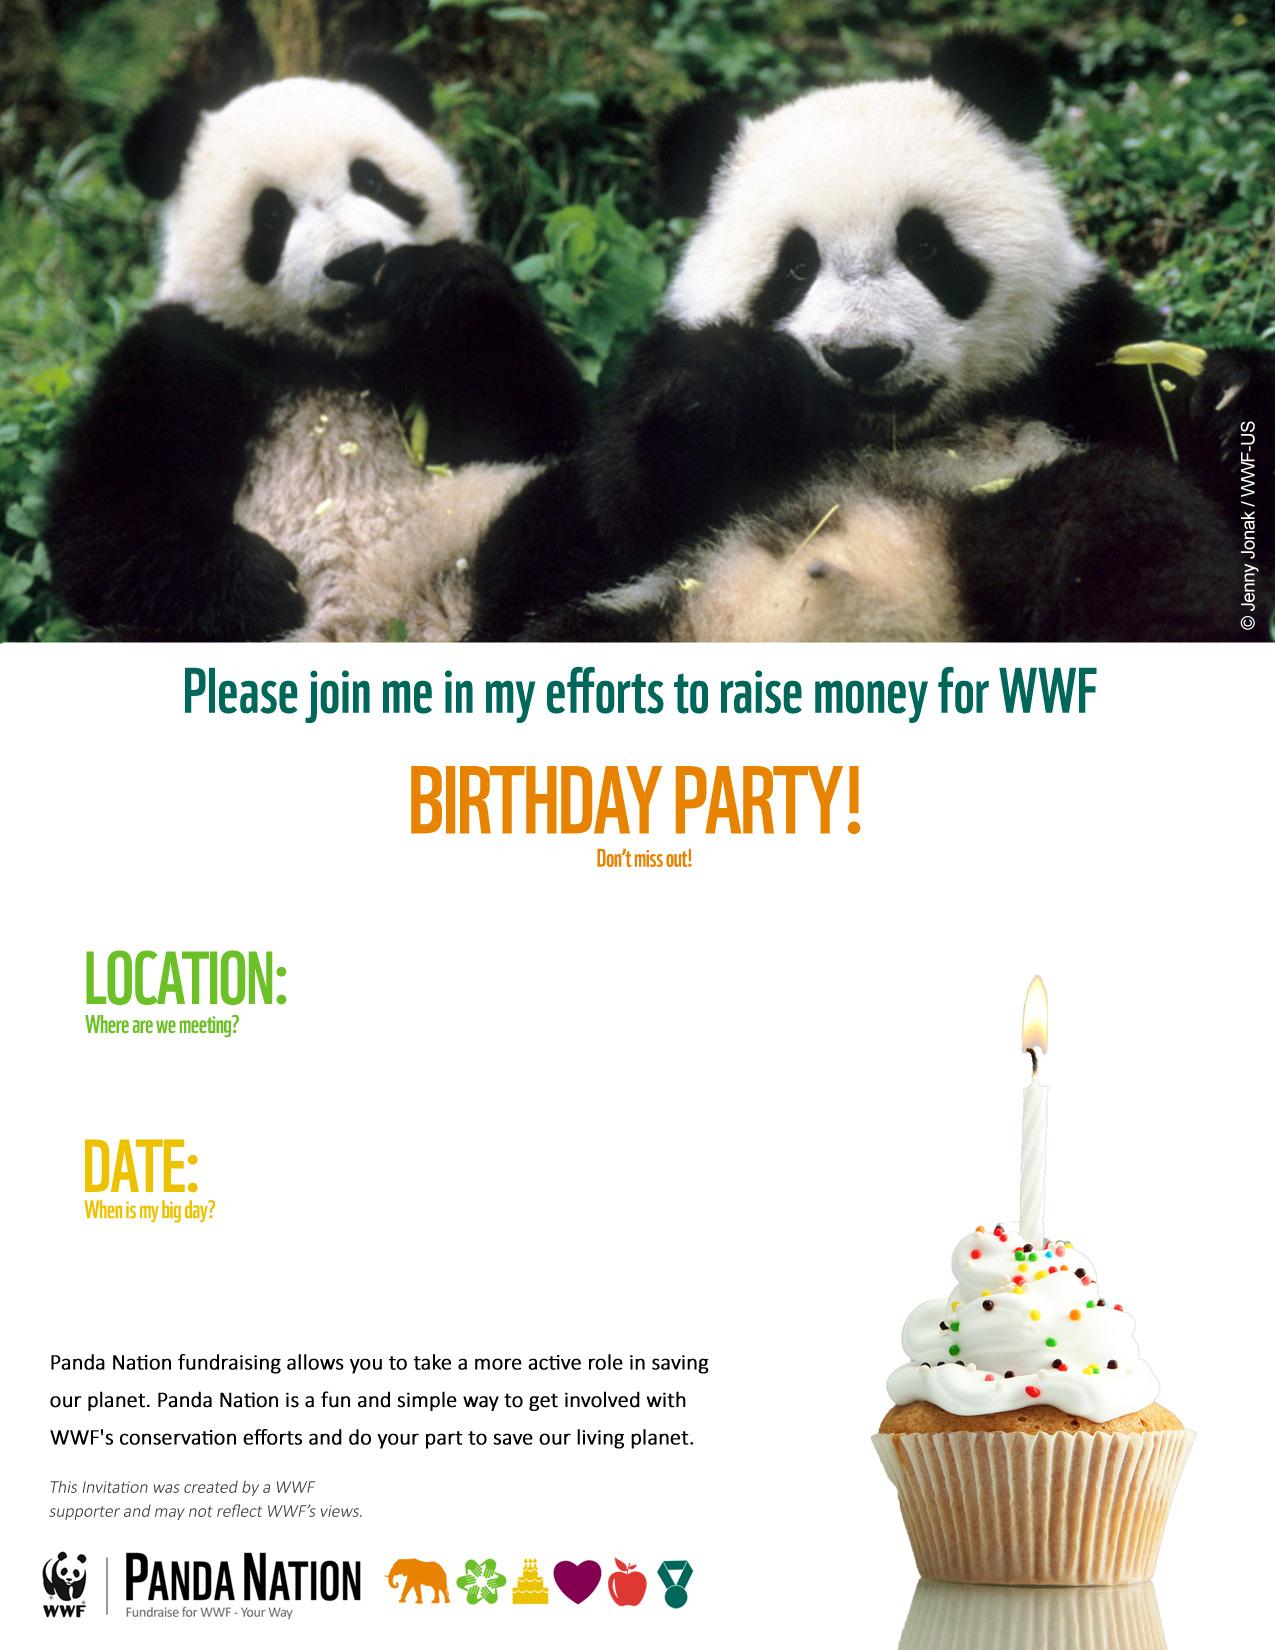 Fundraising Toolkit - Panda Nation | World Wildlife Fund